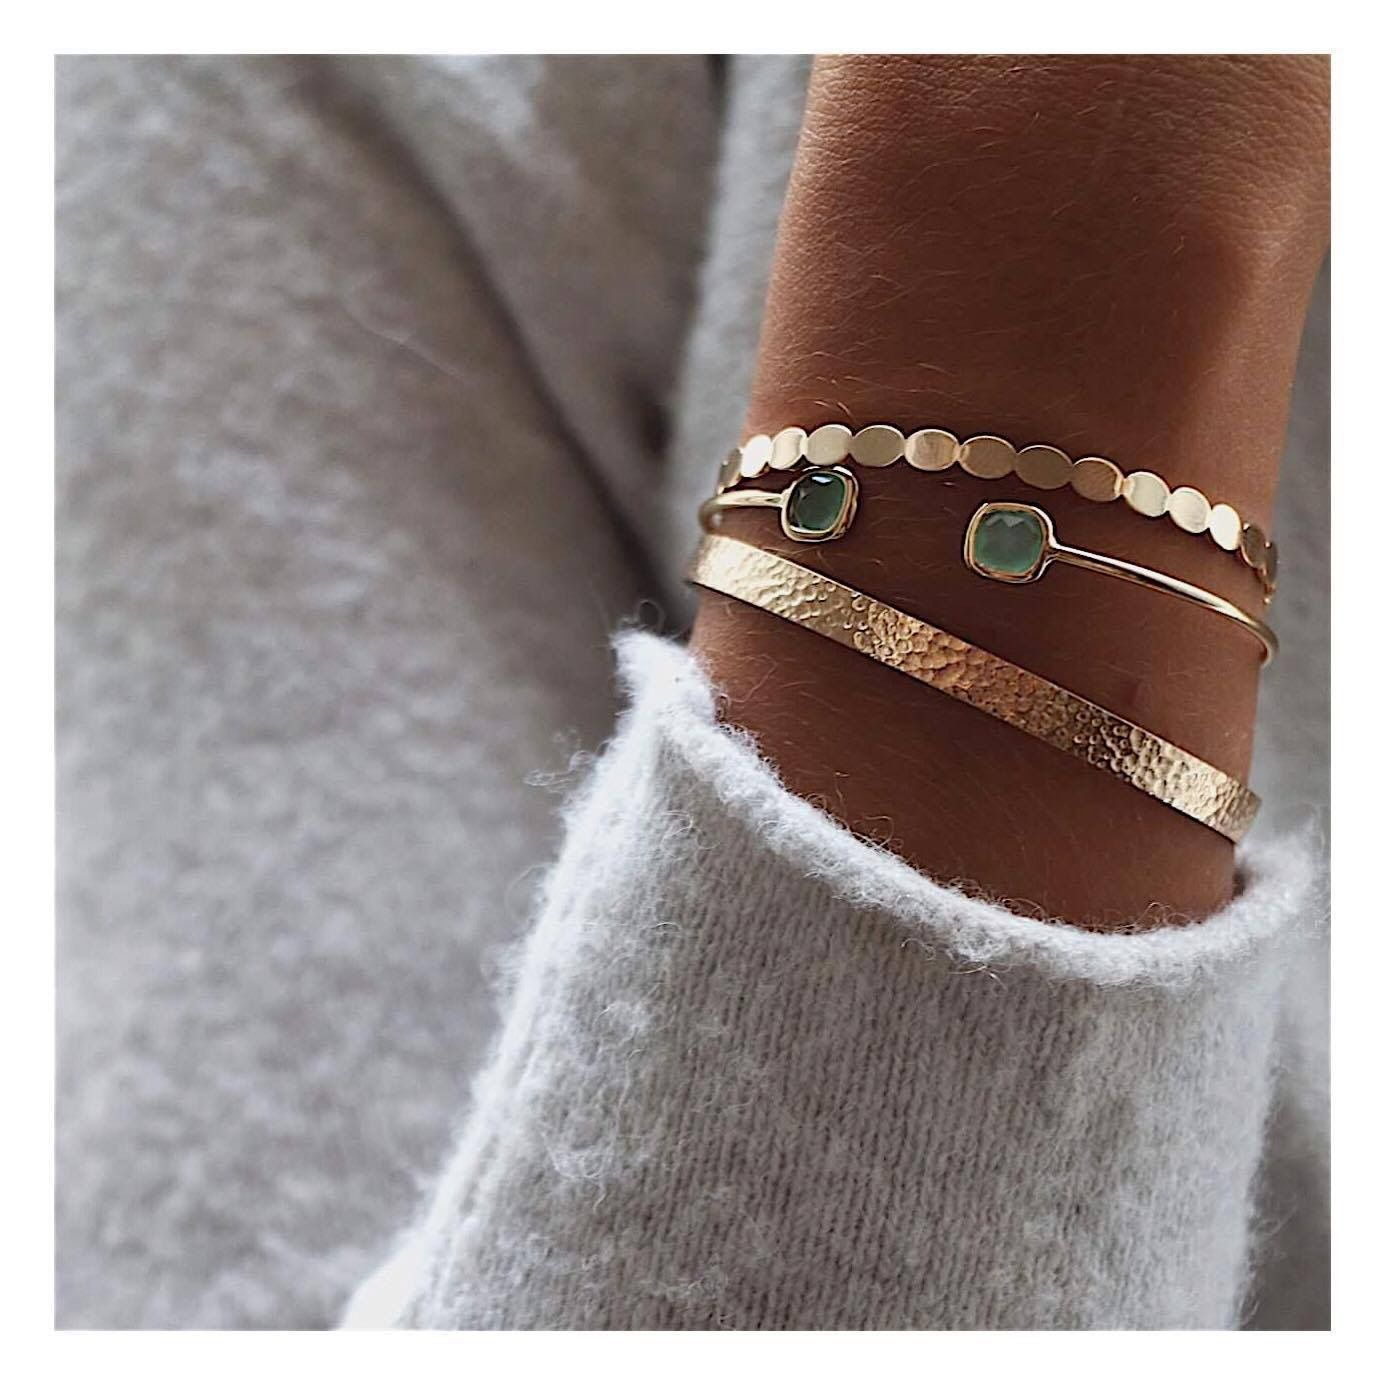 Pin by havilah jude on jewls pinterest jewelry bracelets and